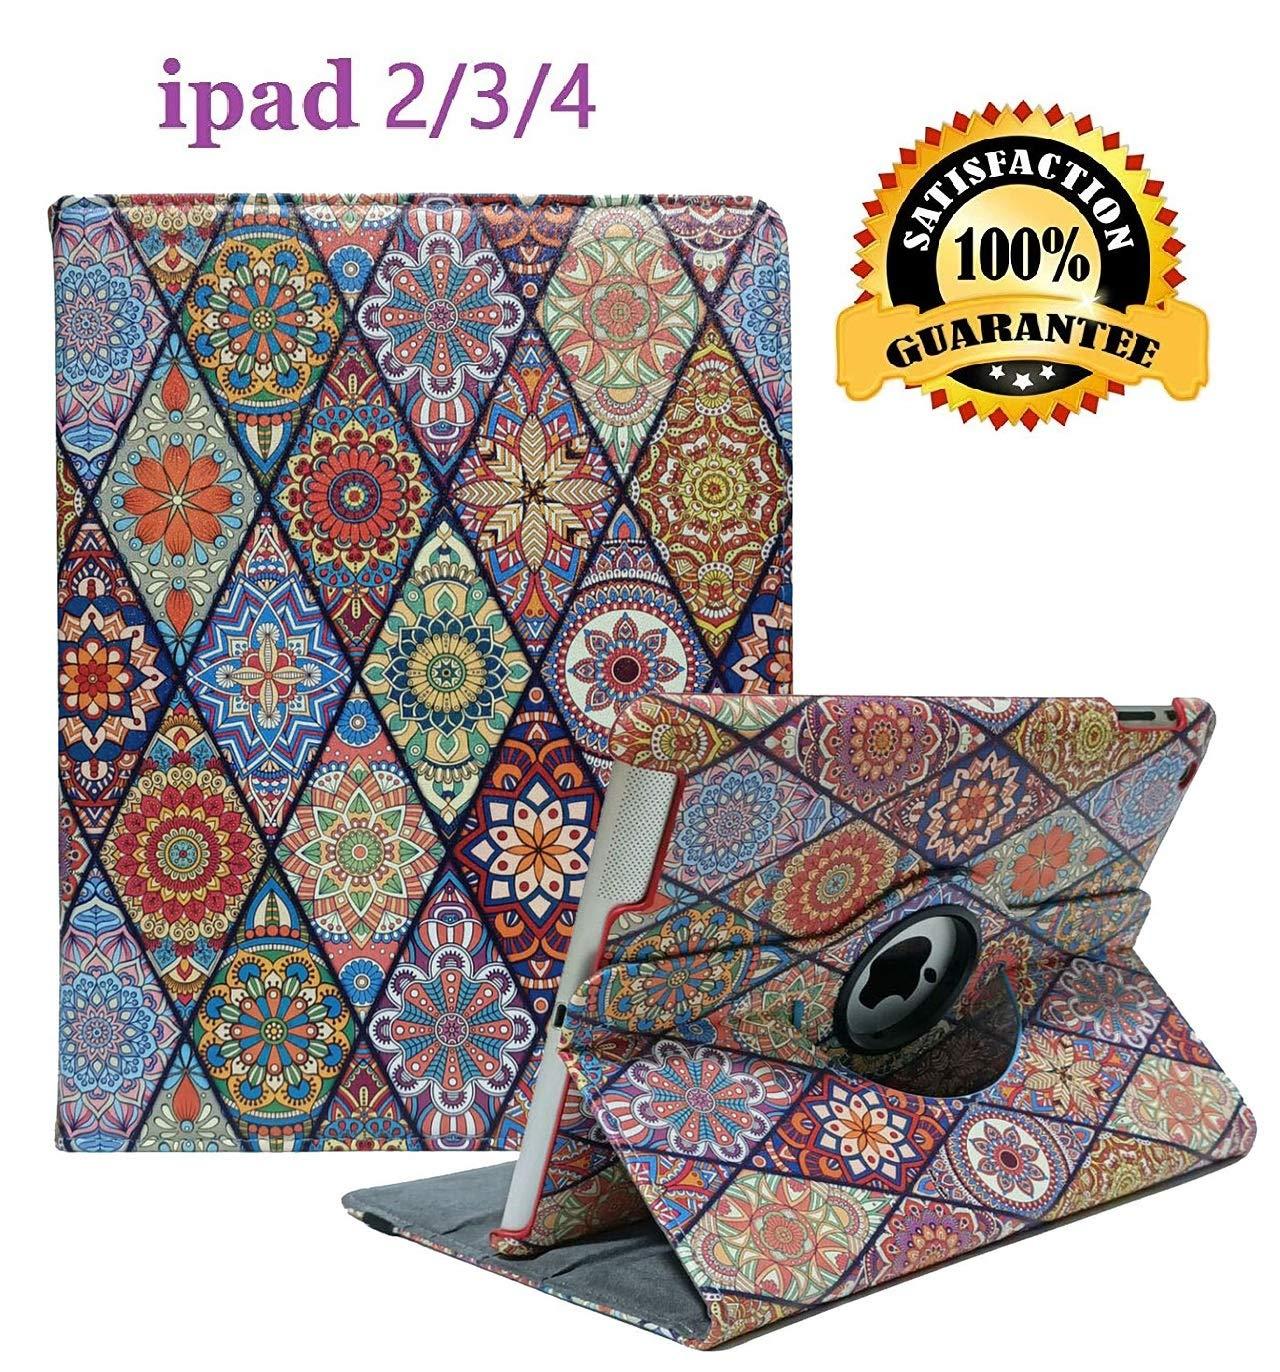 iPad 2/3/4 Case - 360 Degree Rotating Stand Smart Case Protective Cover with Auto Wake Up/Sleep Feature for Apple iPad 4, iPad 3 & iPad 2 (Diamond Flowers)